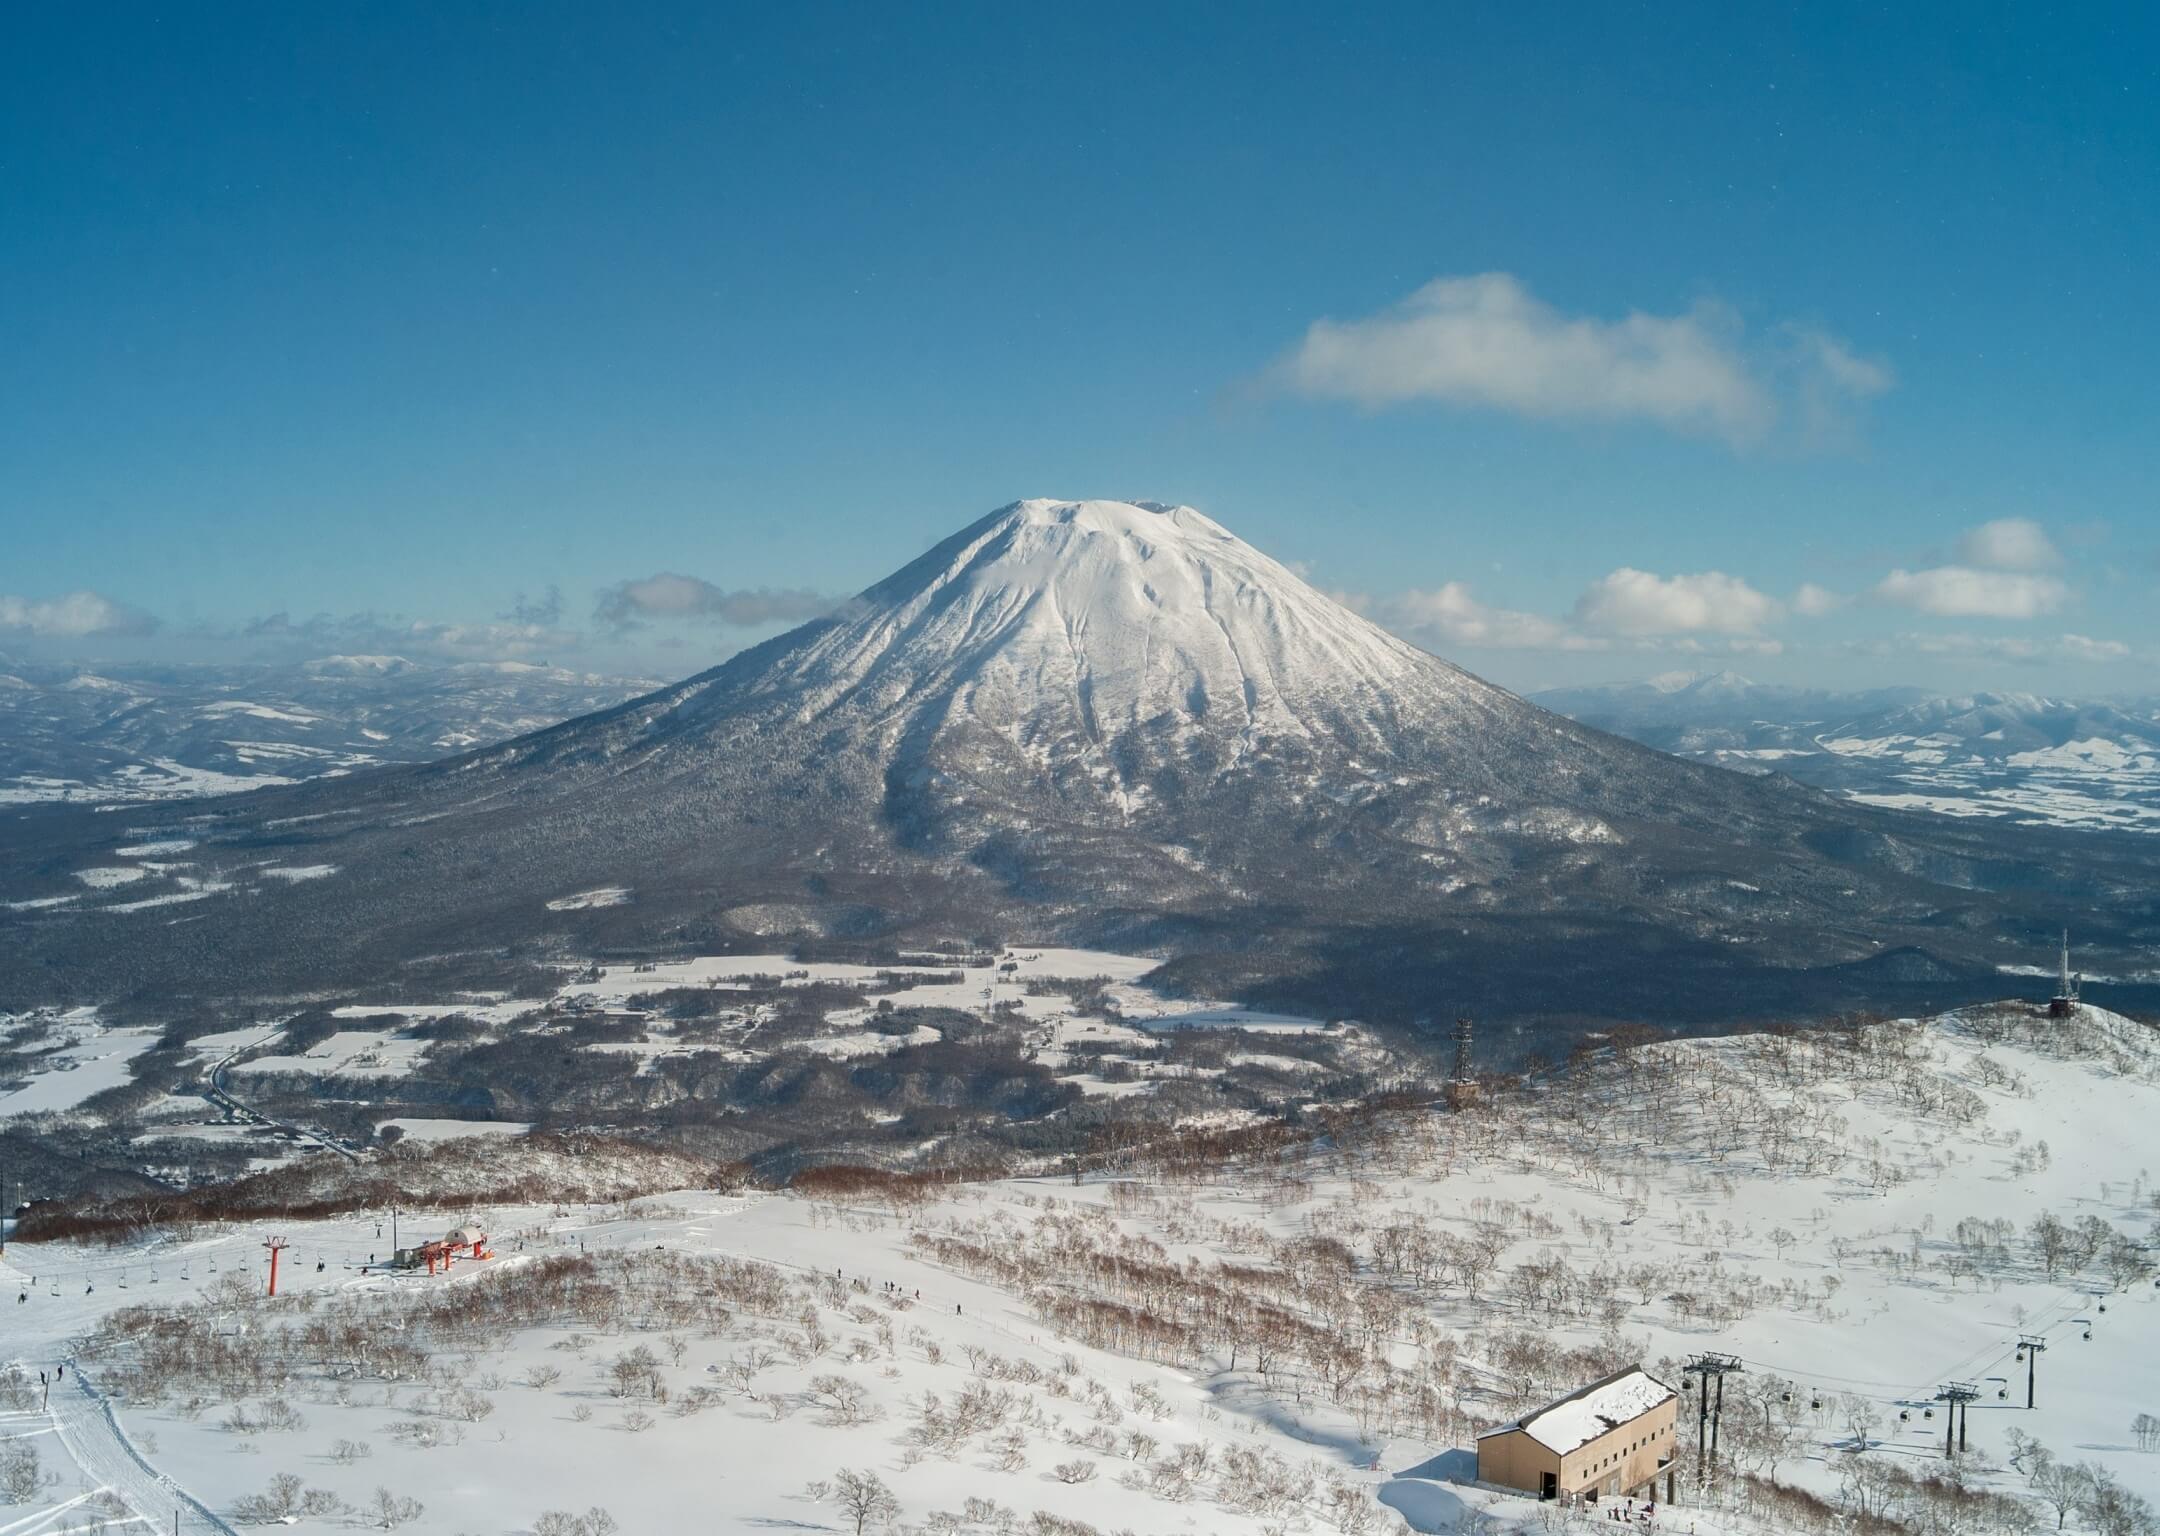 Mt Yotei, Hokkaido, Japan by Hamish Duncan on Leica M Series